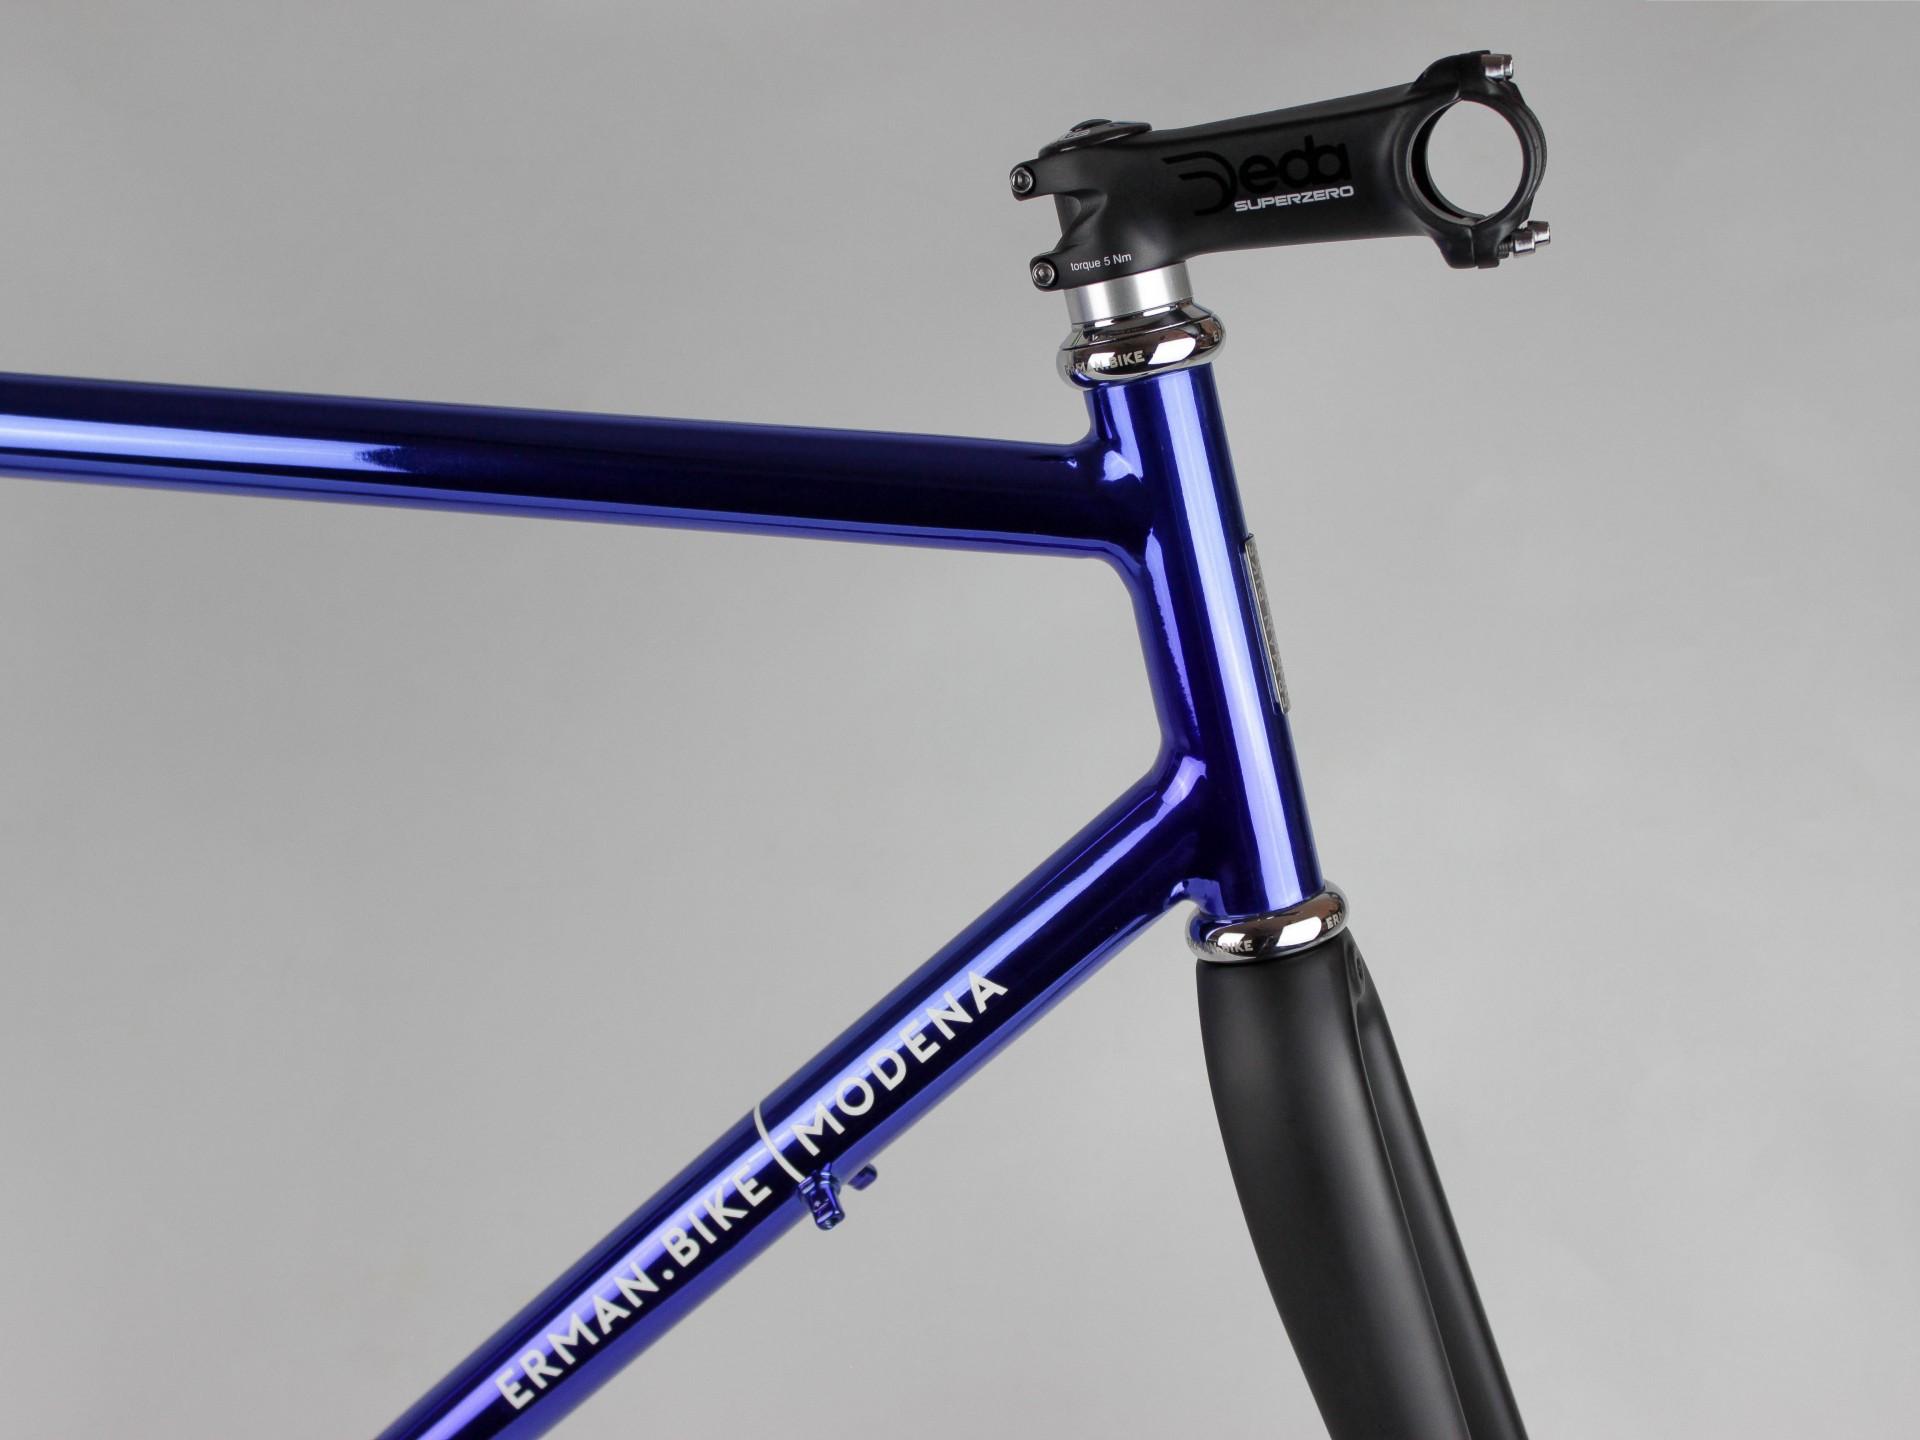 stancaroad_cromovelata_stanca_road_erman_bike_modena-1